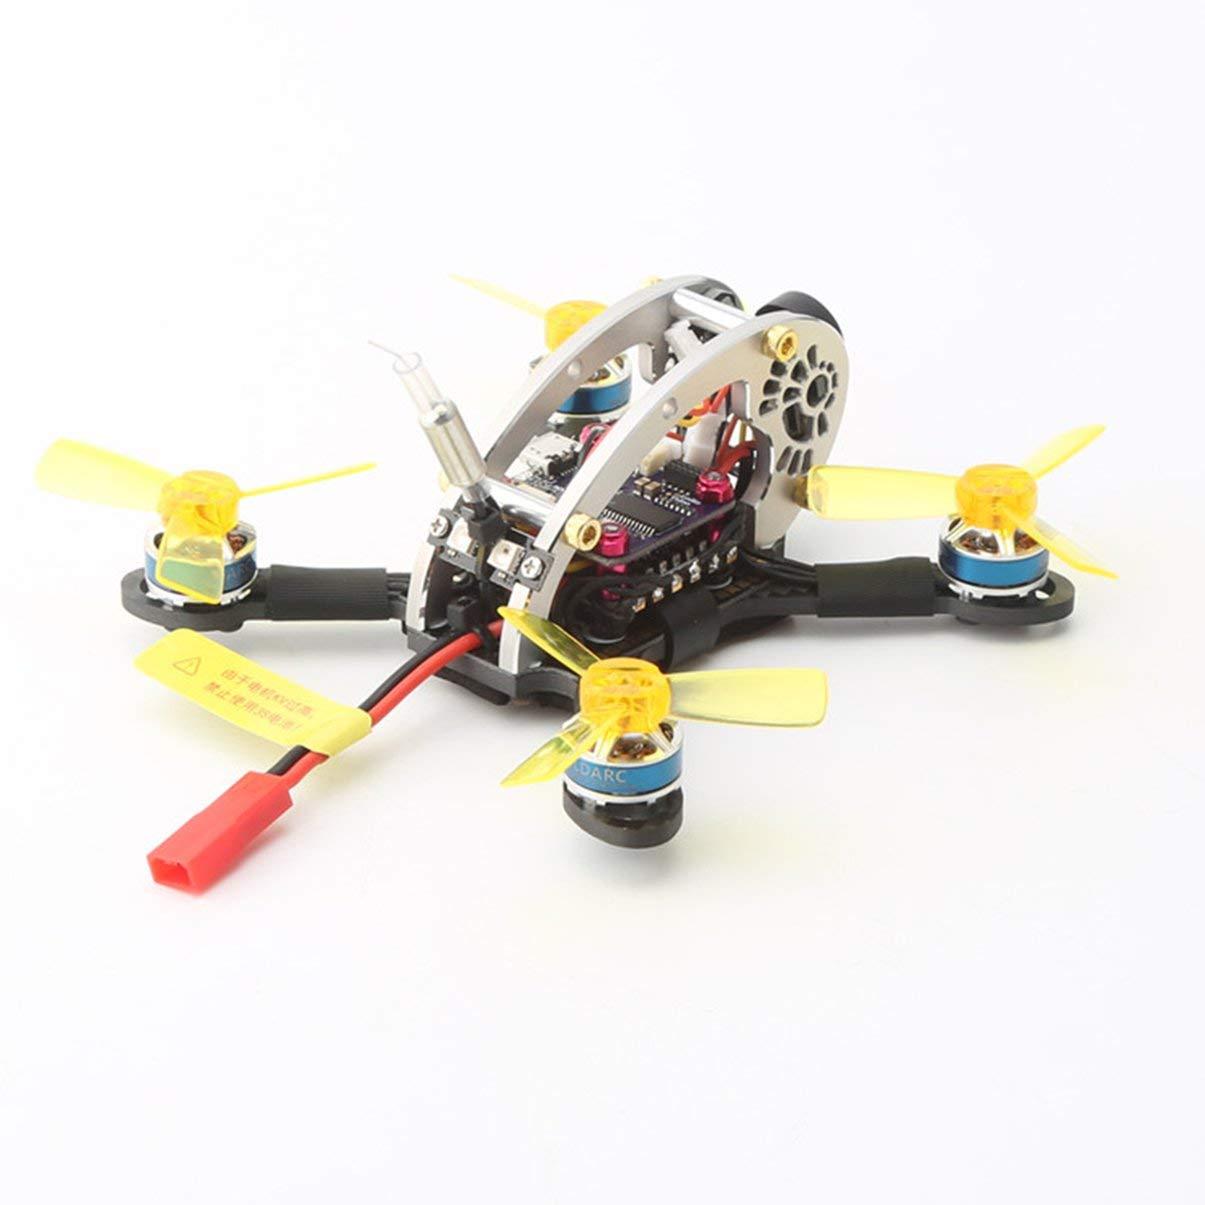 JullyeleDEgant LDARC Flyegg 130 V2 5.8G Micro Mini Brushless FPV RC Racing Drohne Quadcopter mit RX2A PRO Empfänger VTX Kamera OSD PNP Version